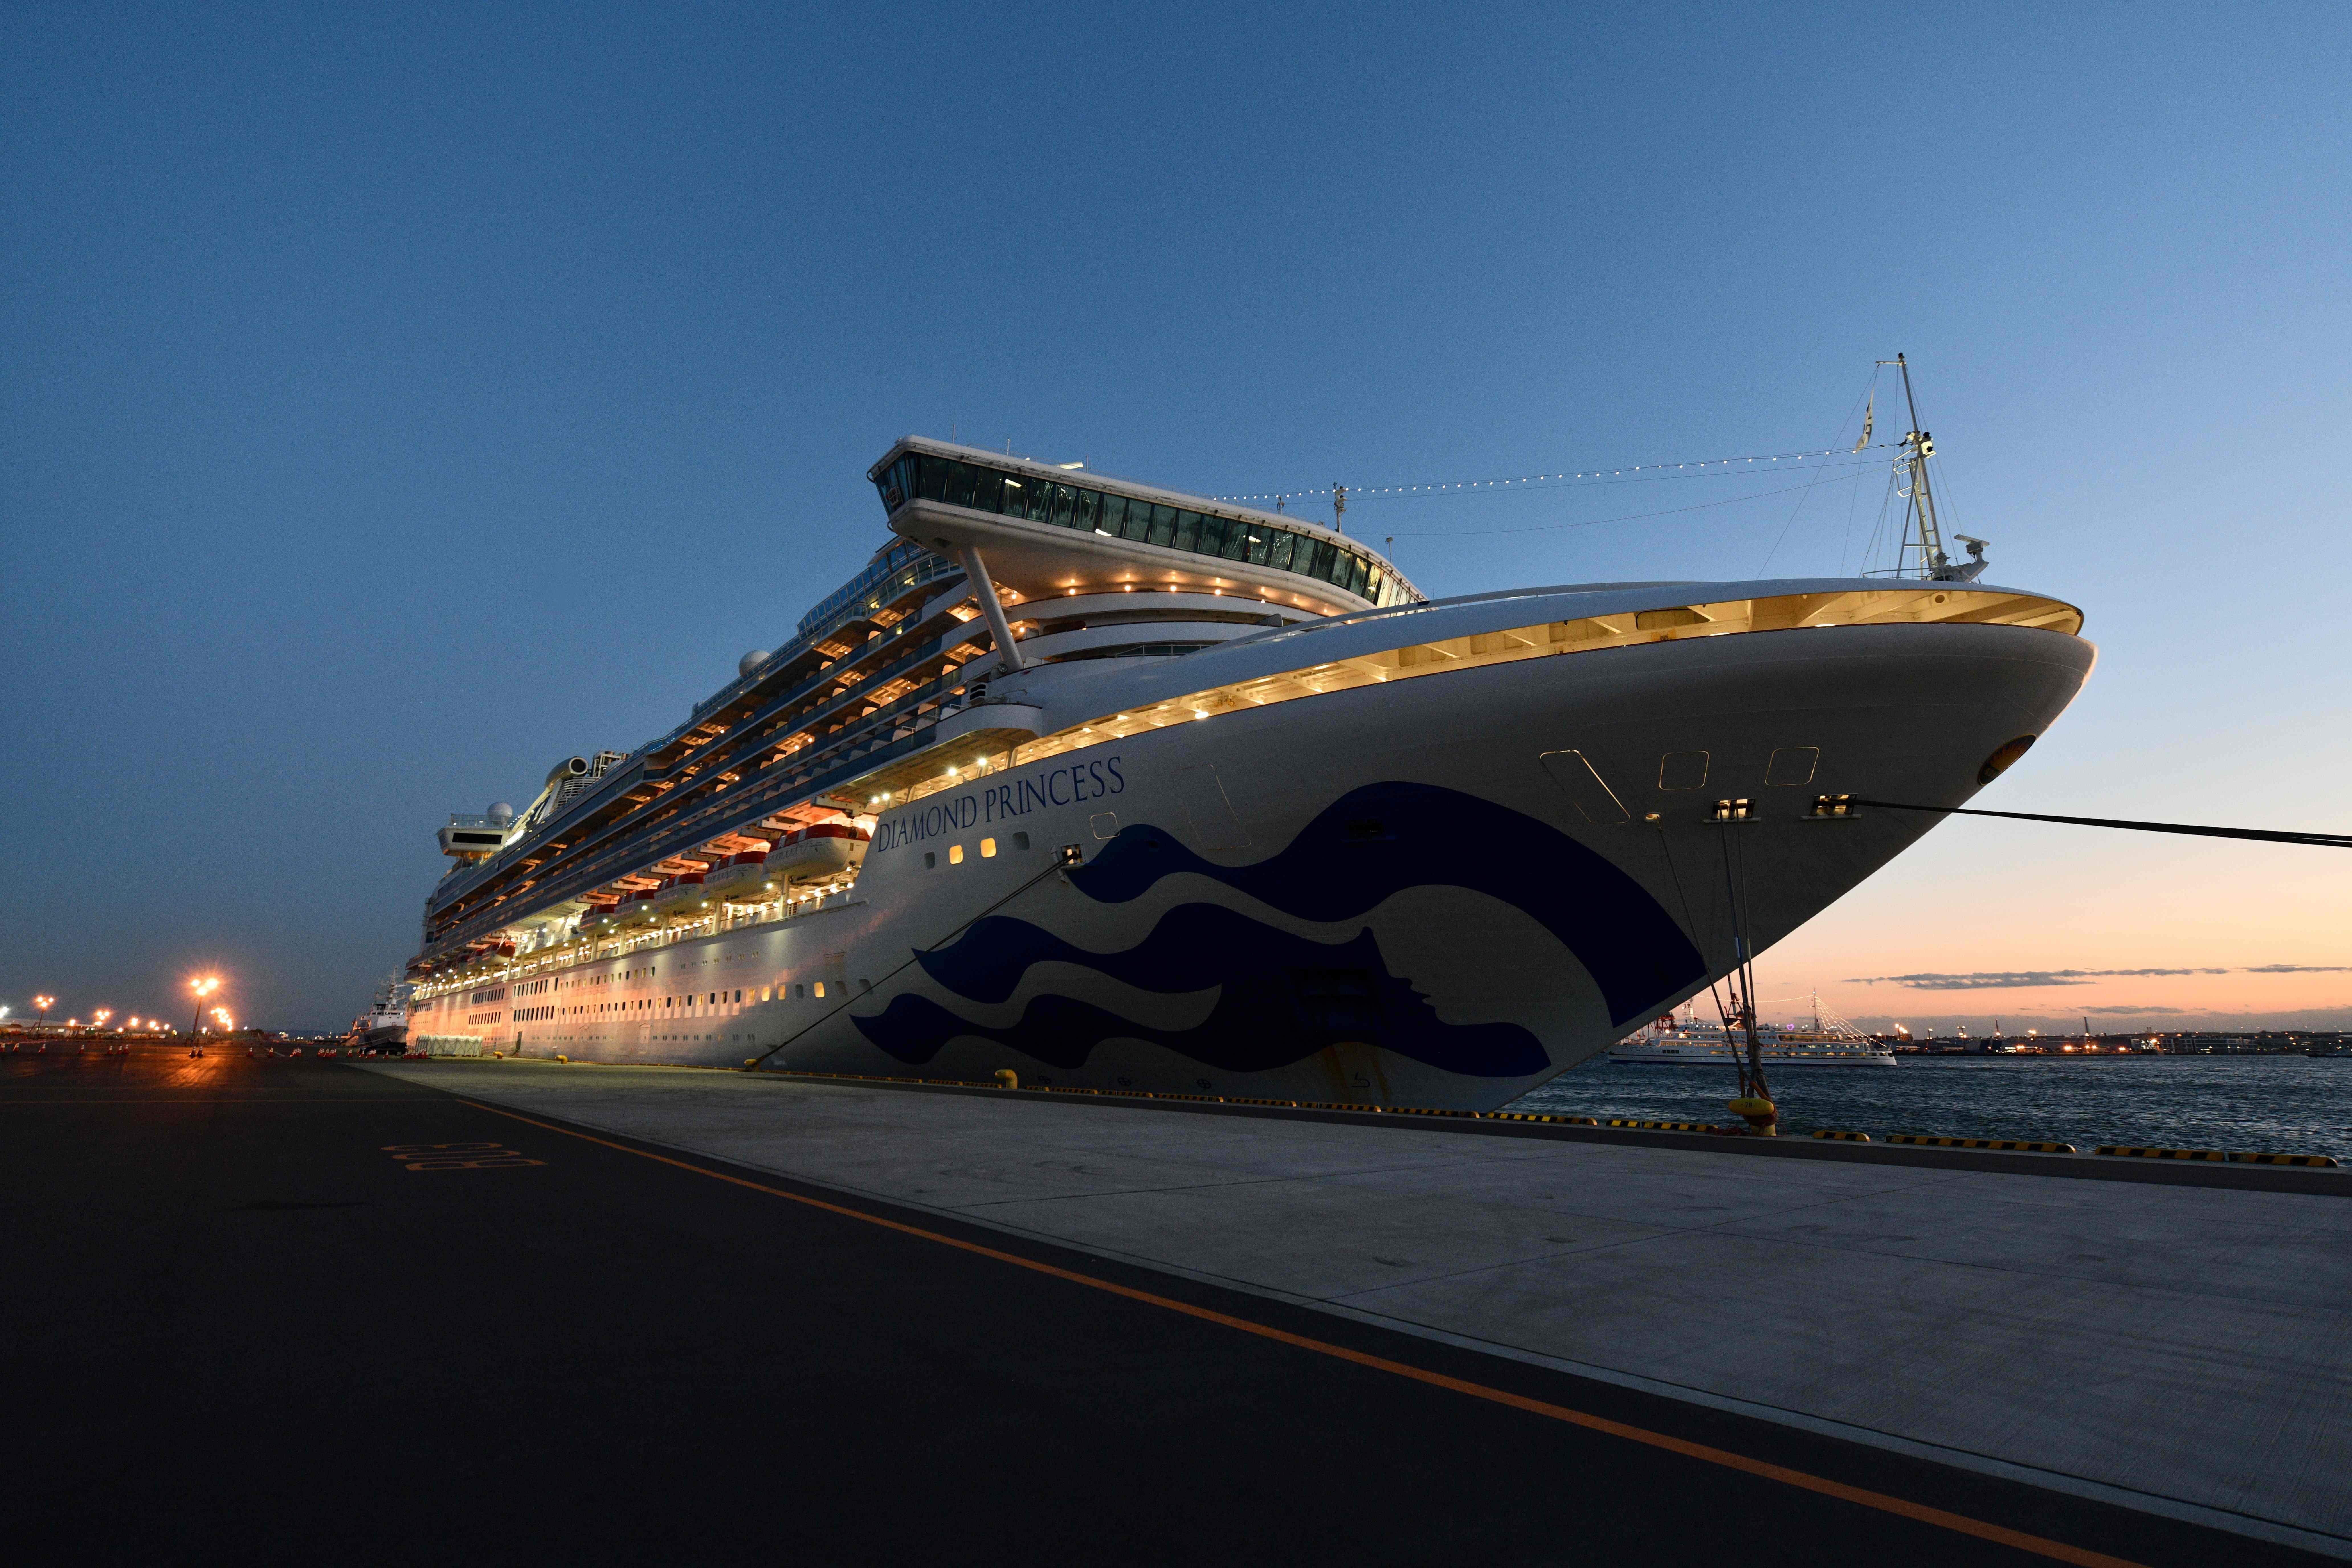 The Diamond Princess cruise ship in Yokohama port on February 6, 2020.